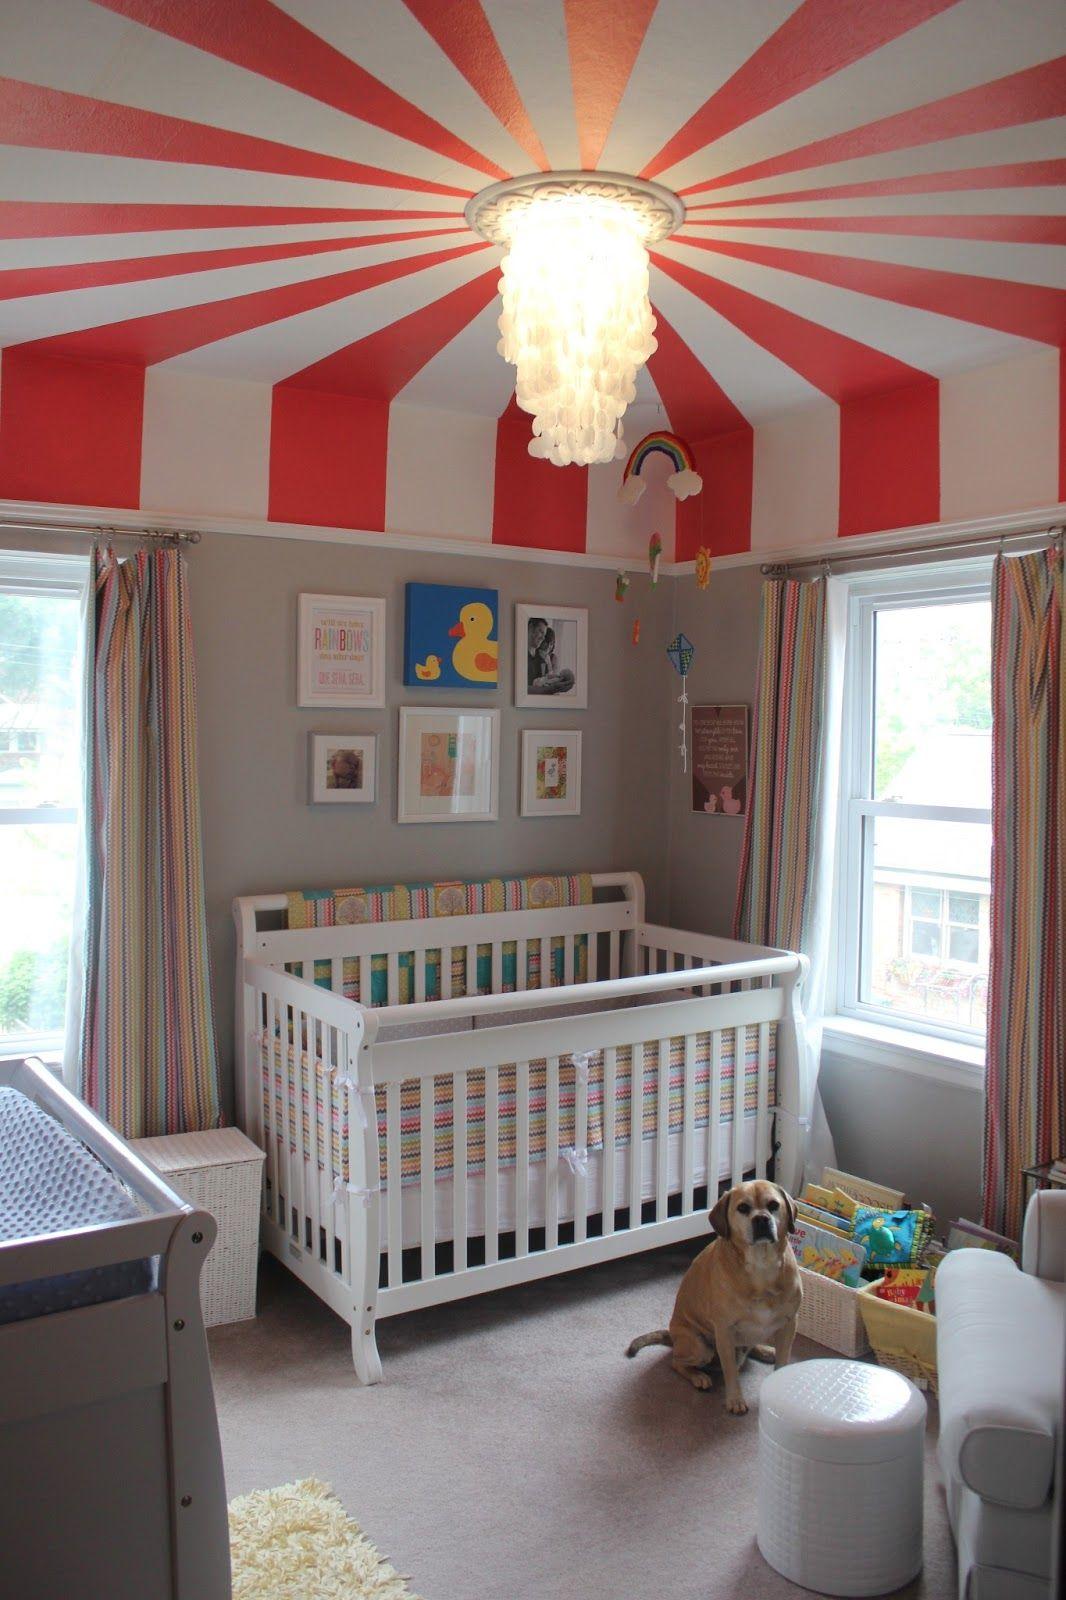 The Nursery Baby Bedroom Design Ideas Creative Kids Rooms